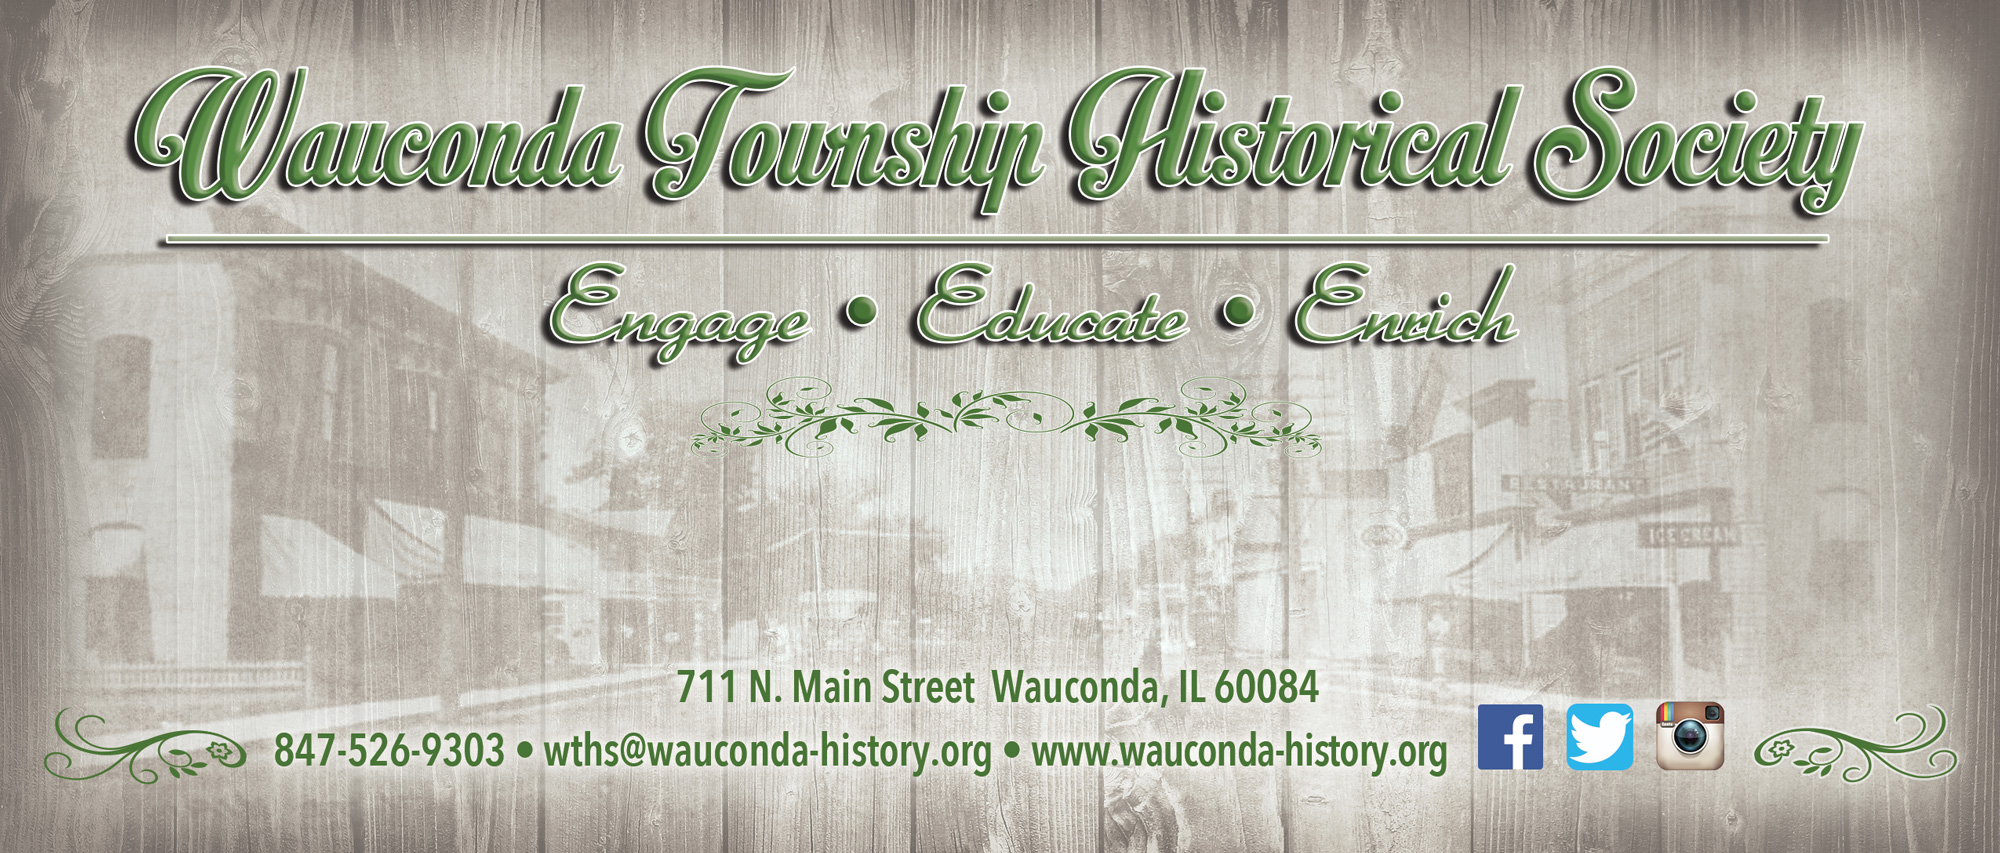 Illinois lake county wauconda - Illinois Lake County Wauconda 50